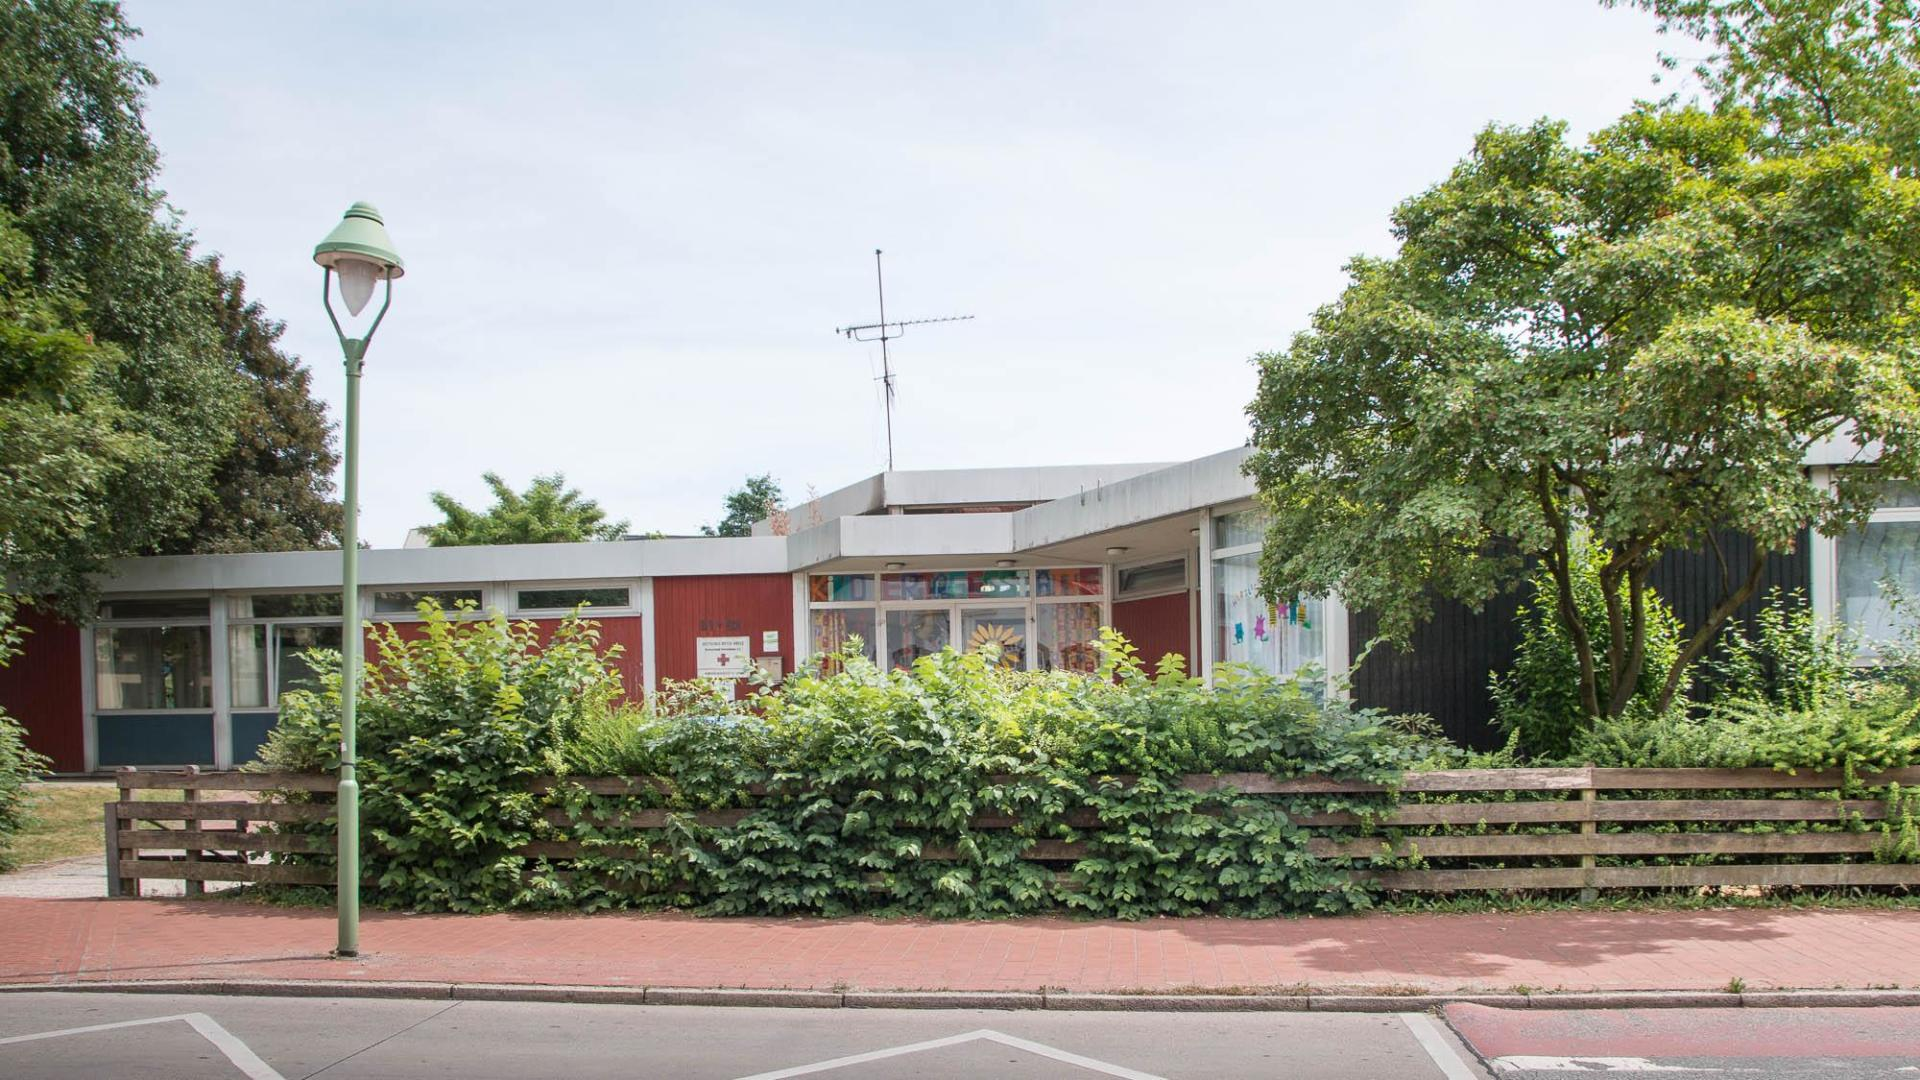 DRK Kindertagesstätte Lehe – Bremerhaven.de